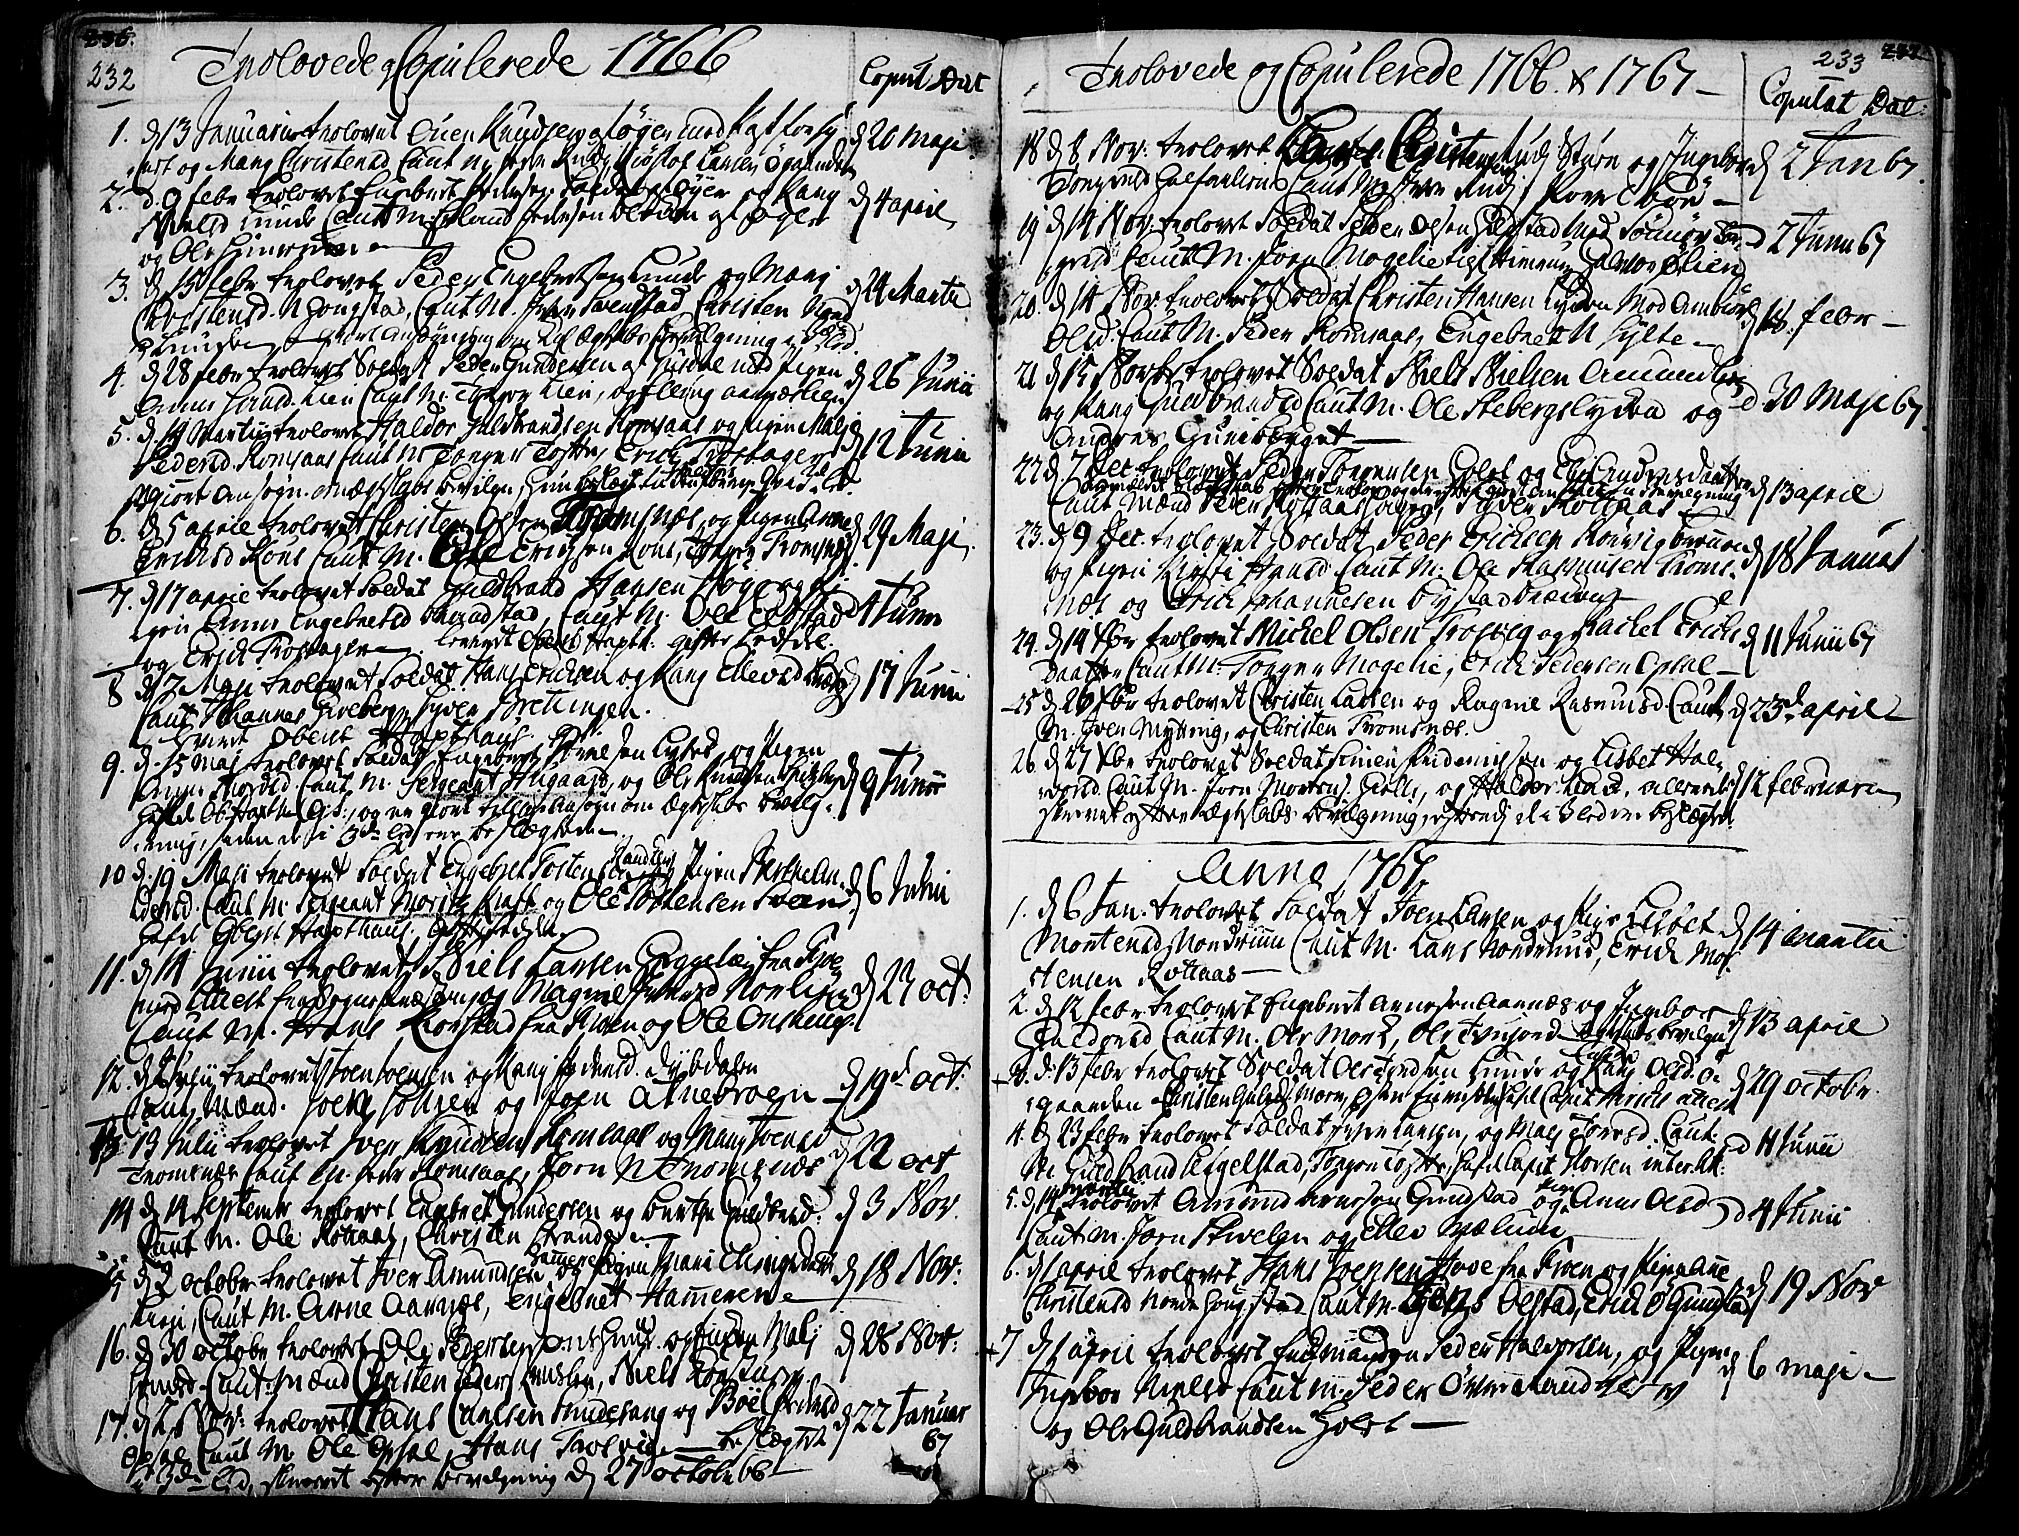 SAH, Ringebu prestekontor, Ministerialbok nr. 2, 1734-1780, s. 232-233